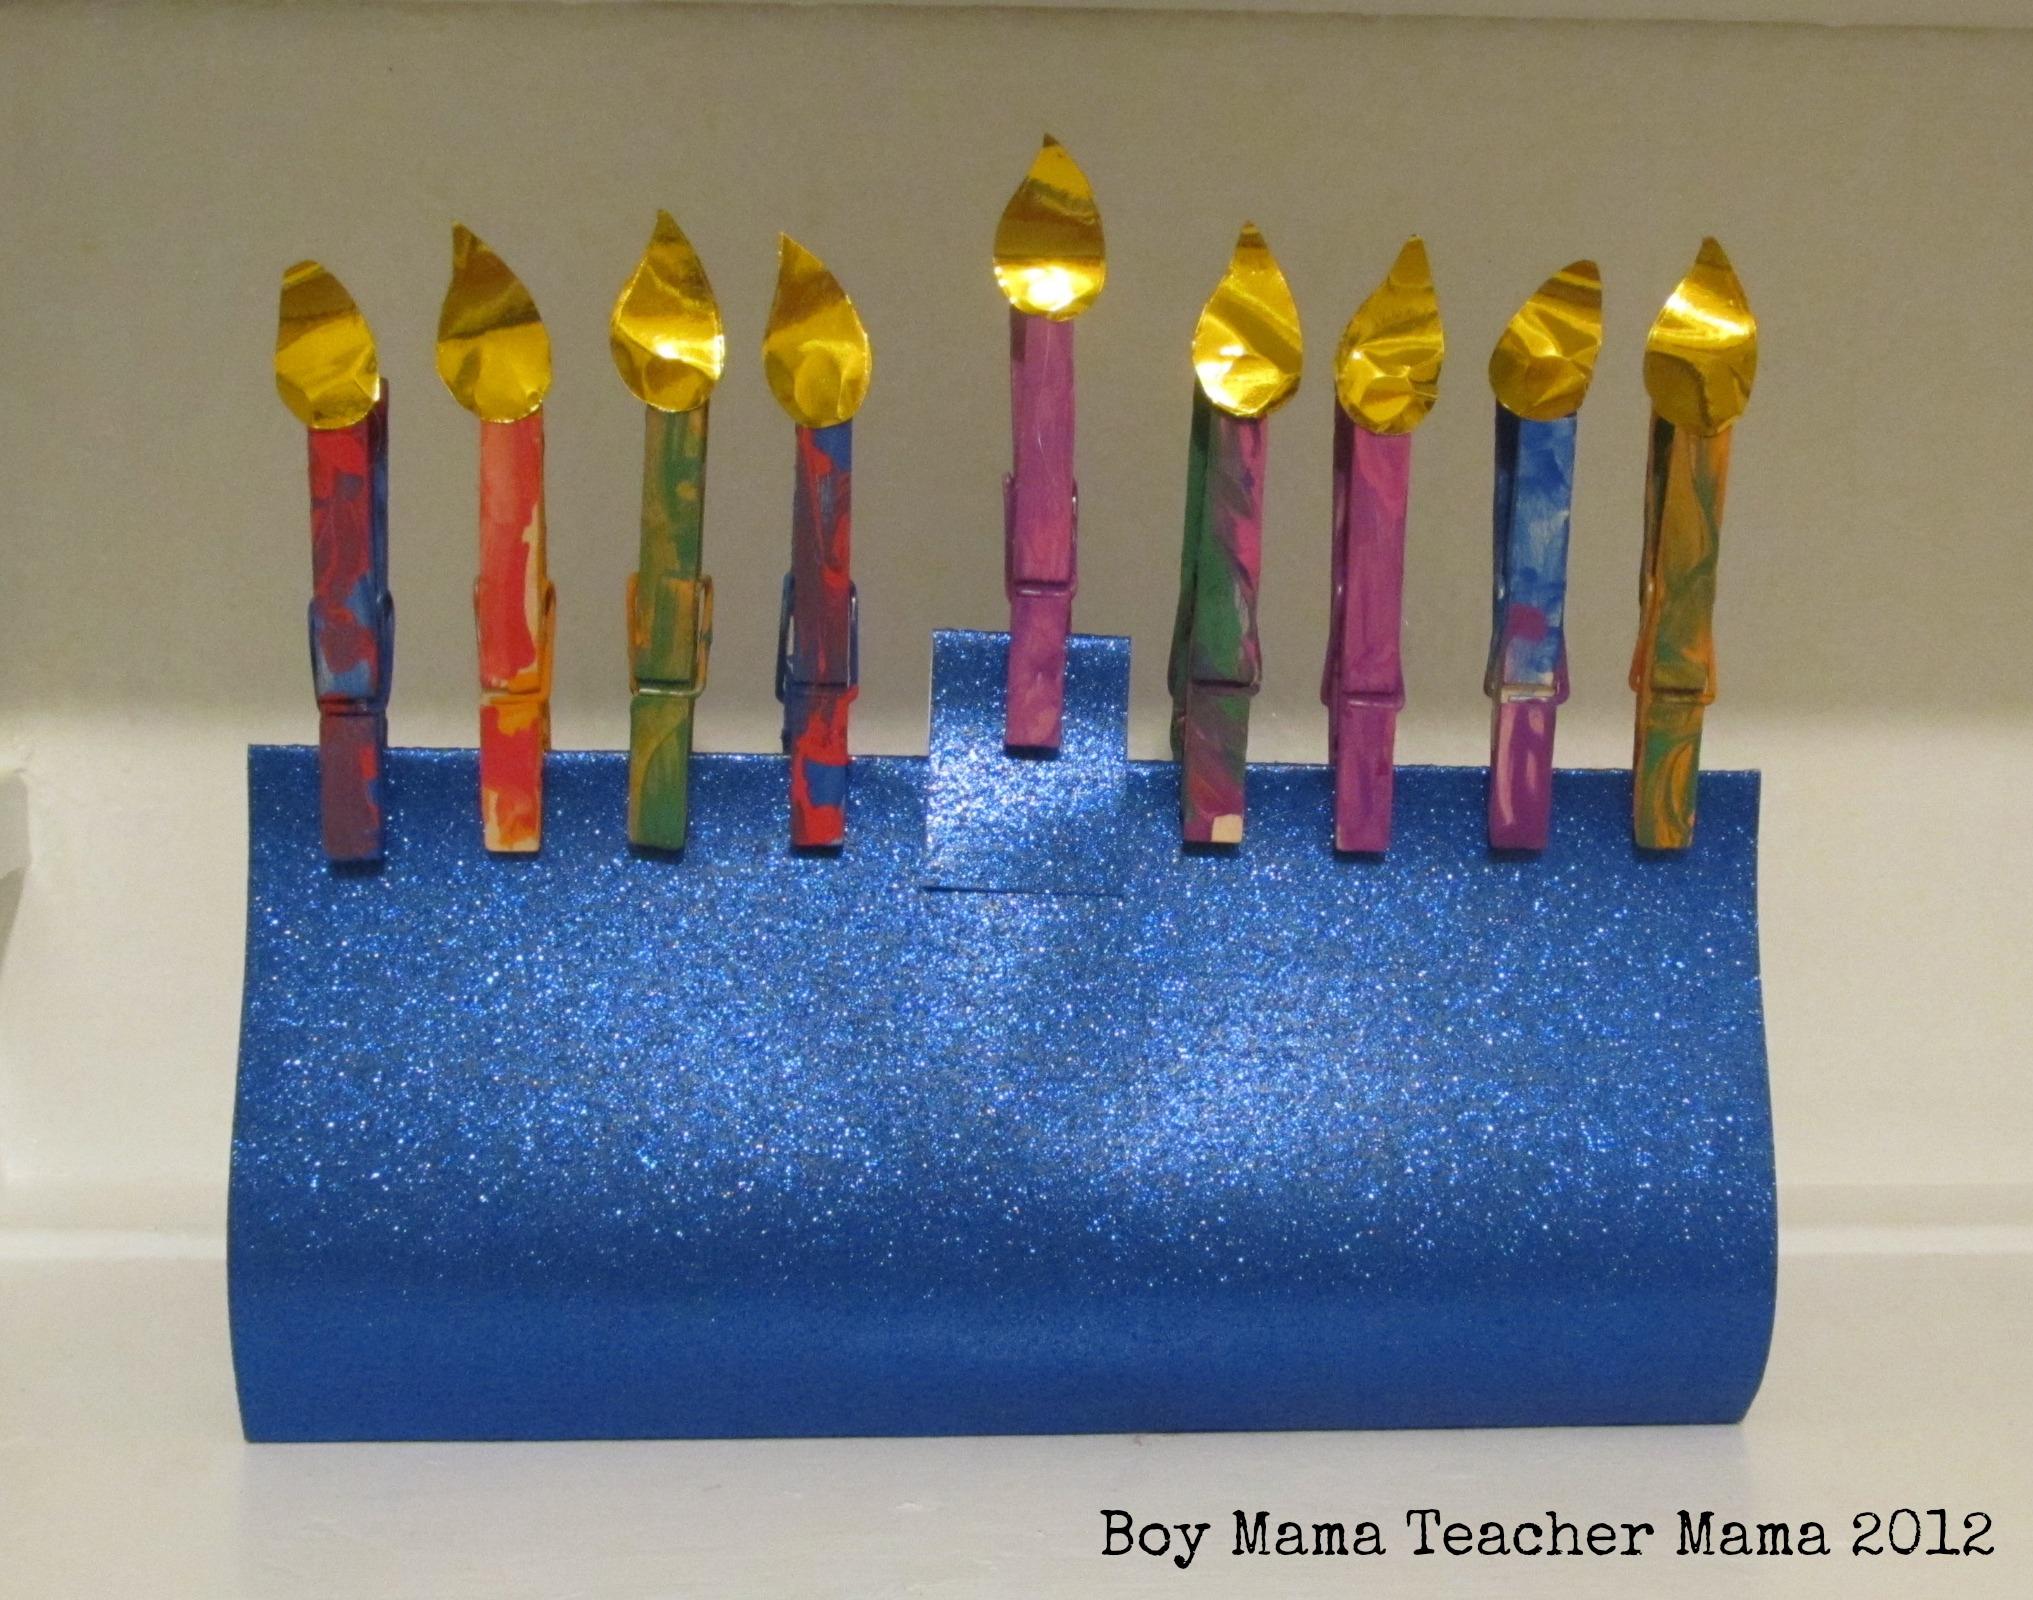 Boy mama clothespin menorah boy mama teacher mama for Menorah arts and crafts